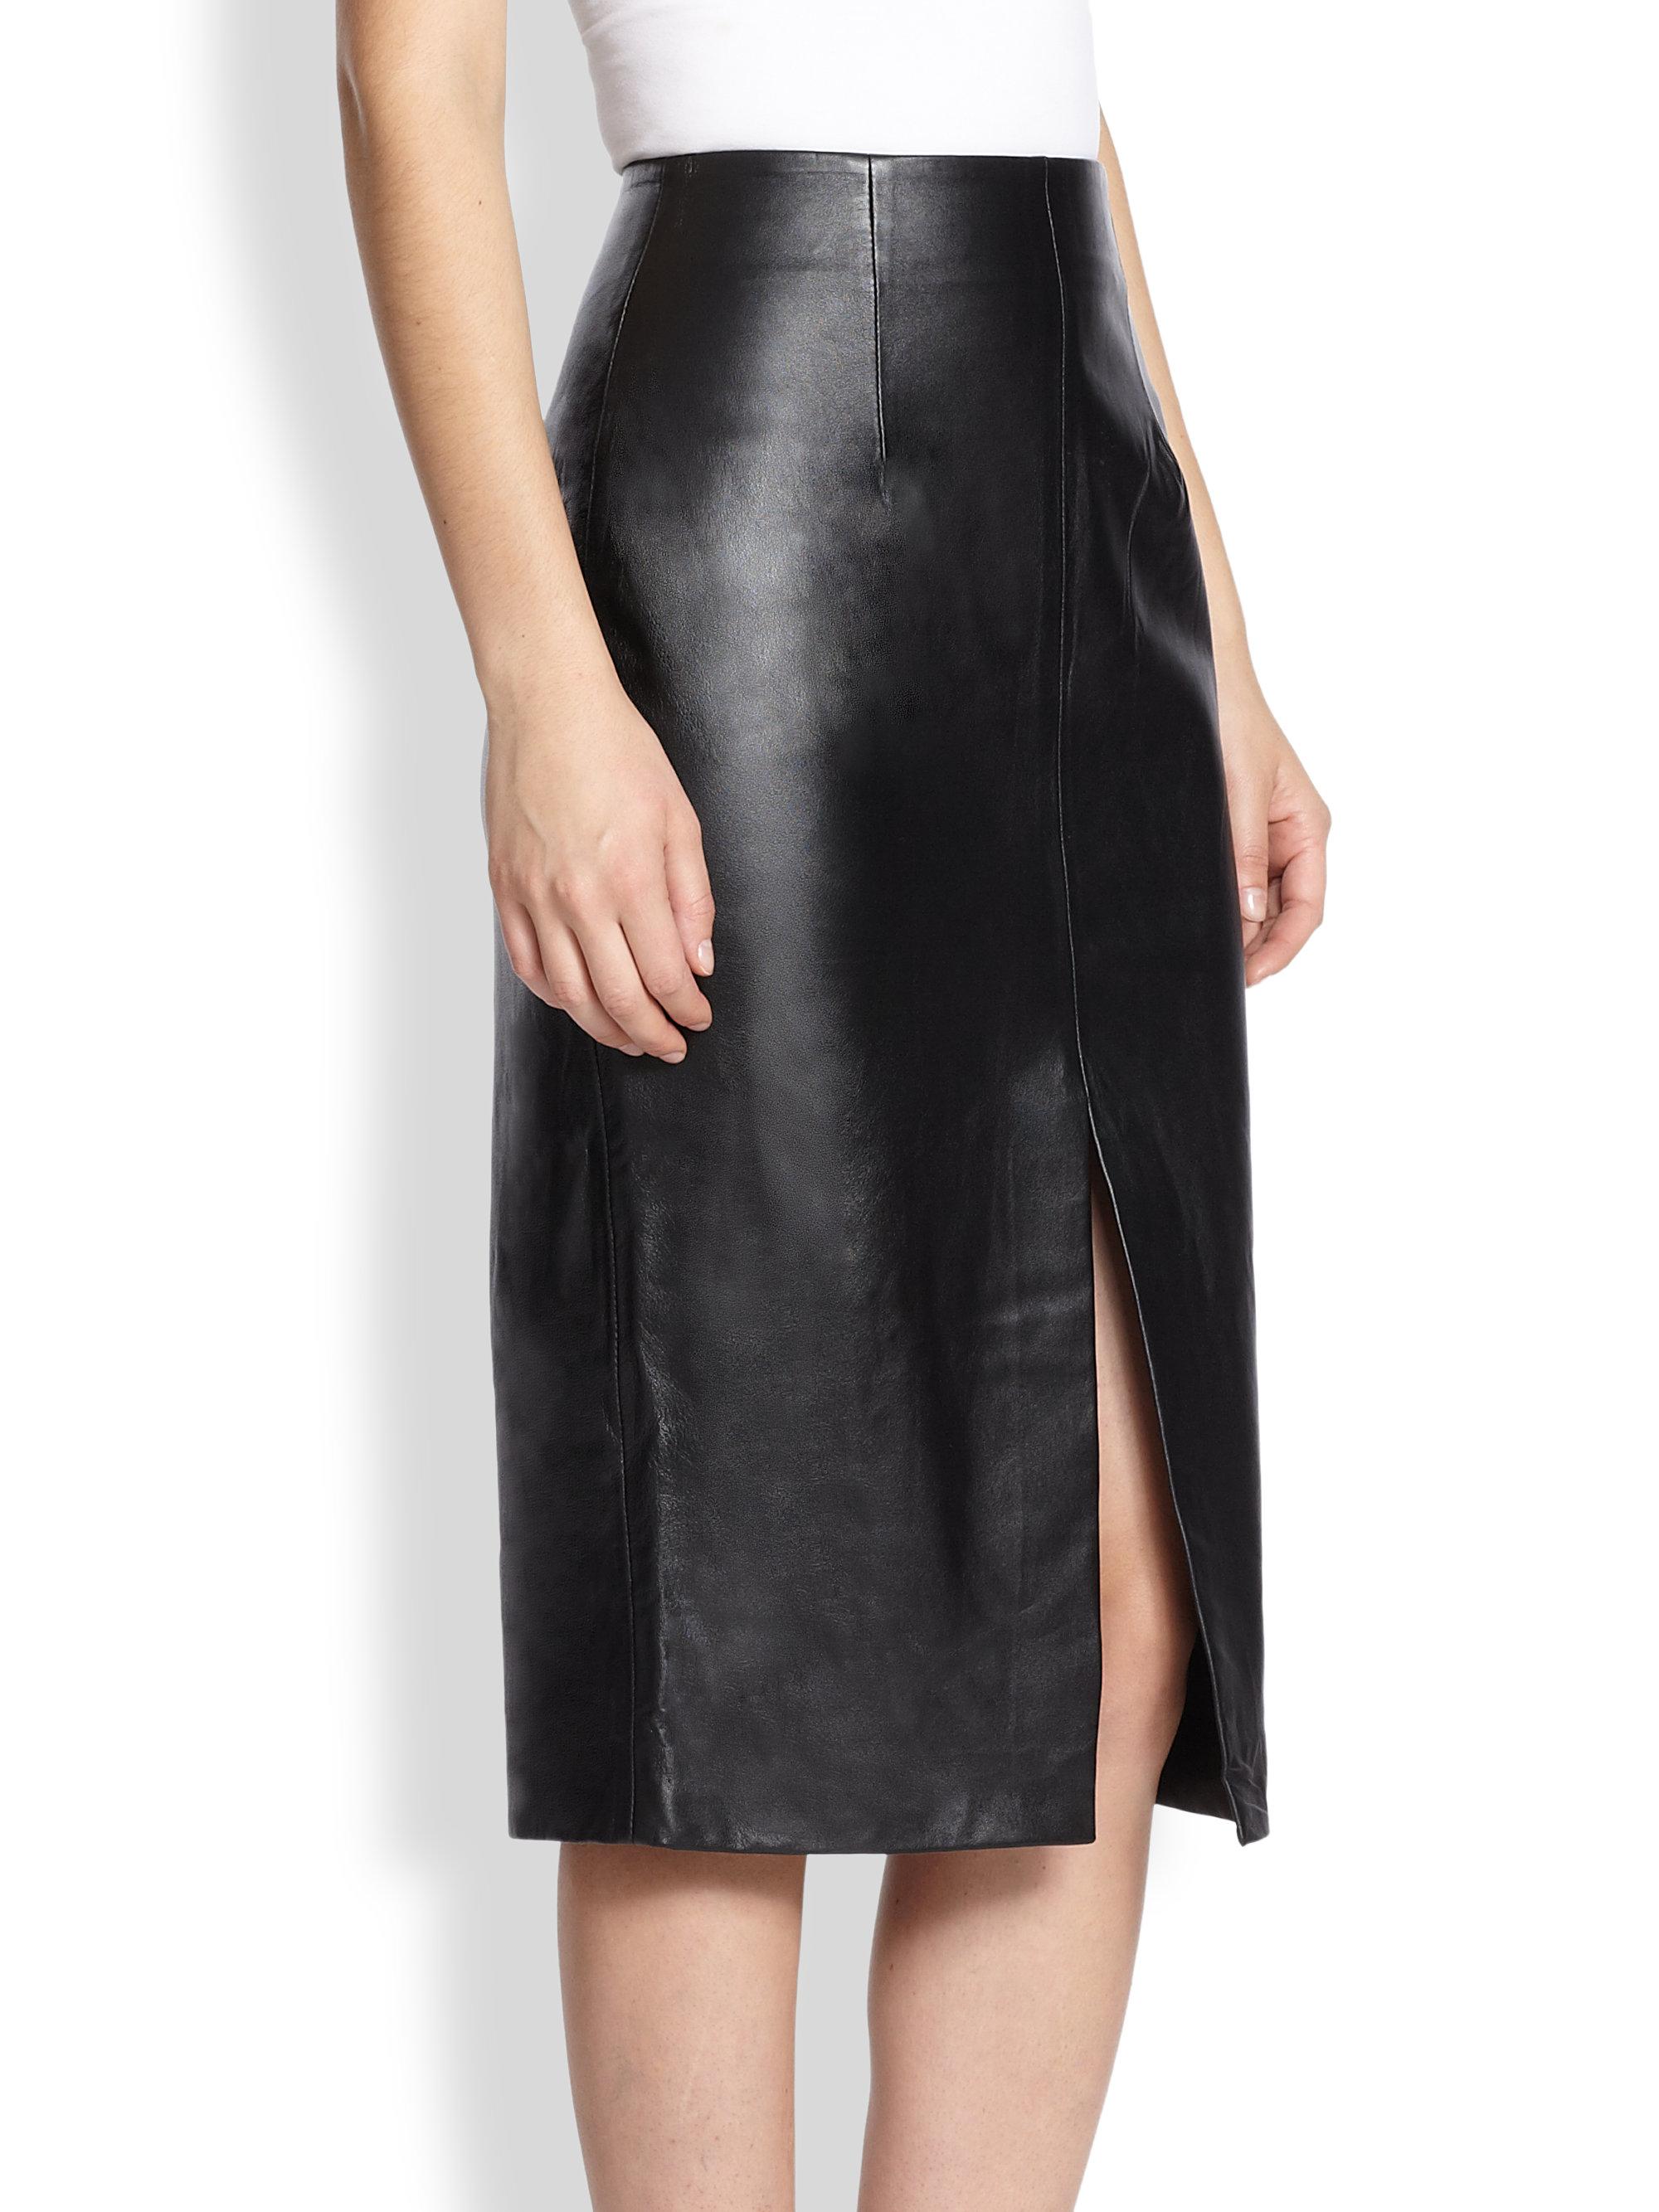 Black Leather Skirt With Split Fashion Skirts